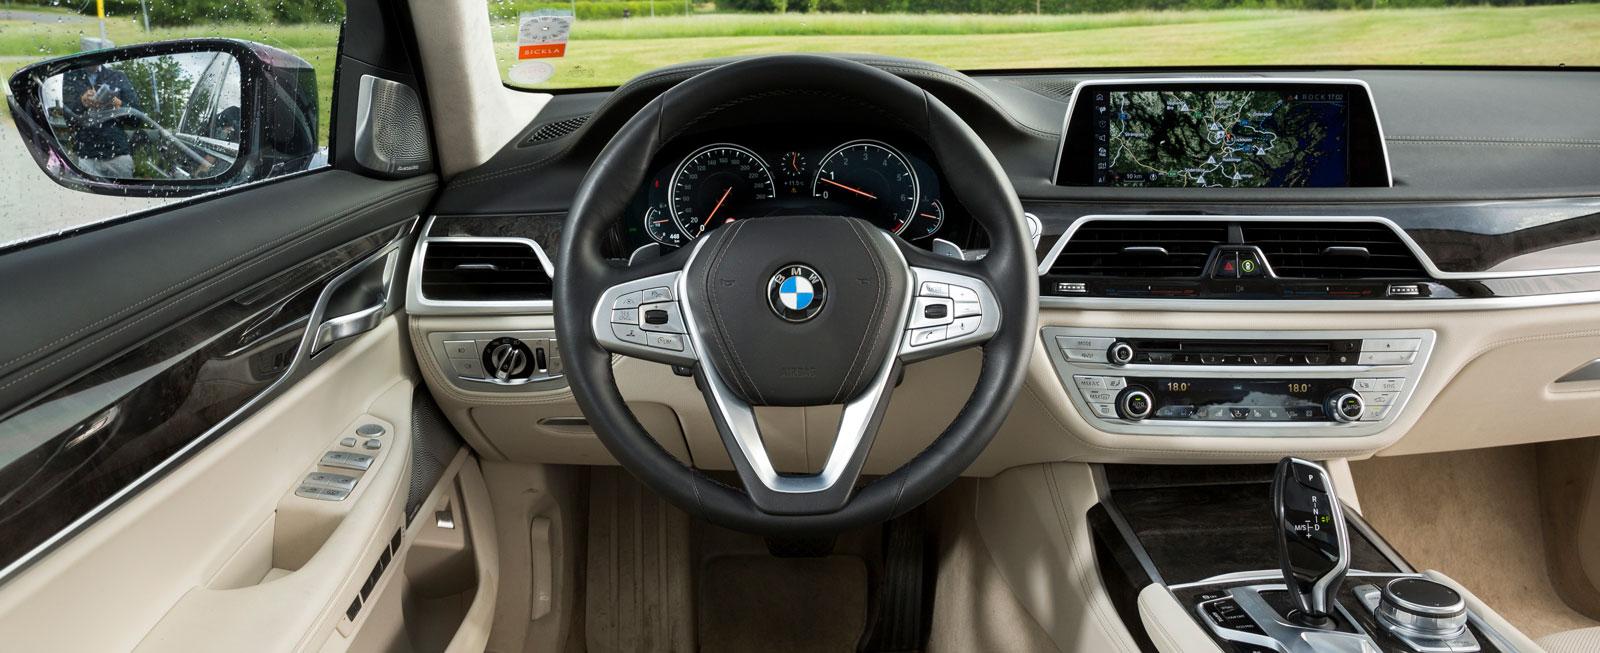 En typisk BMW-inredning i modern tappning. 7-serien upplevs som den mest konventionella rent utseendemässigt.